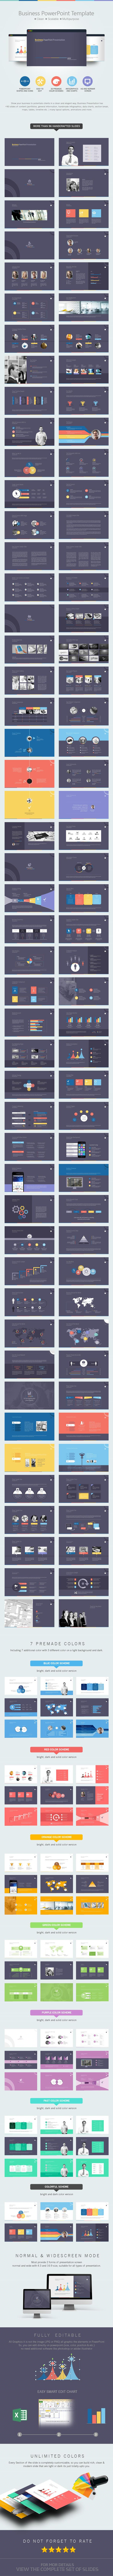 Premium Business Presentation Template